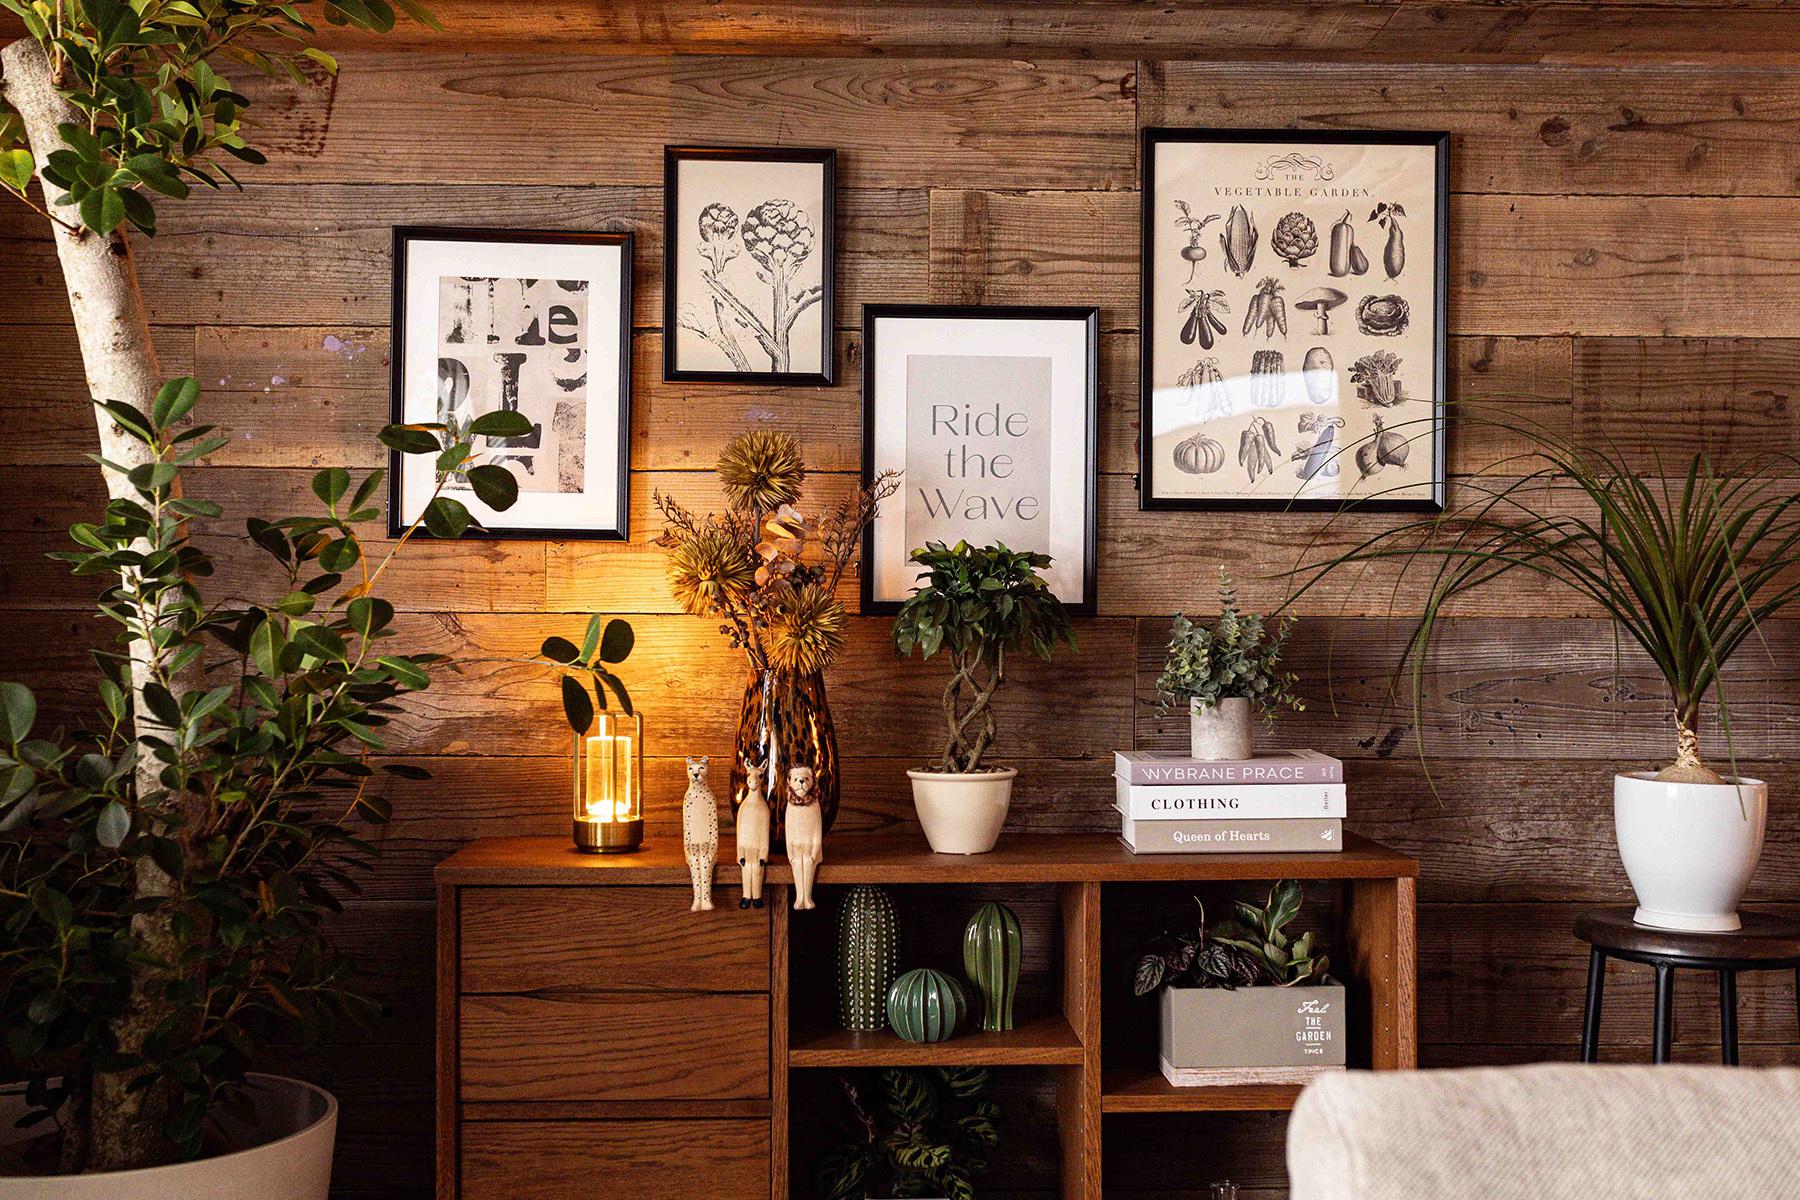 STUDIO FOXTAIL Bst (スタジオ フォックステイル Bst)自然光はもちろん窓裏照明も可能